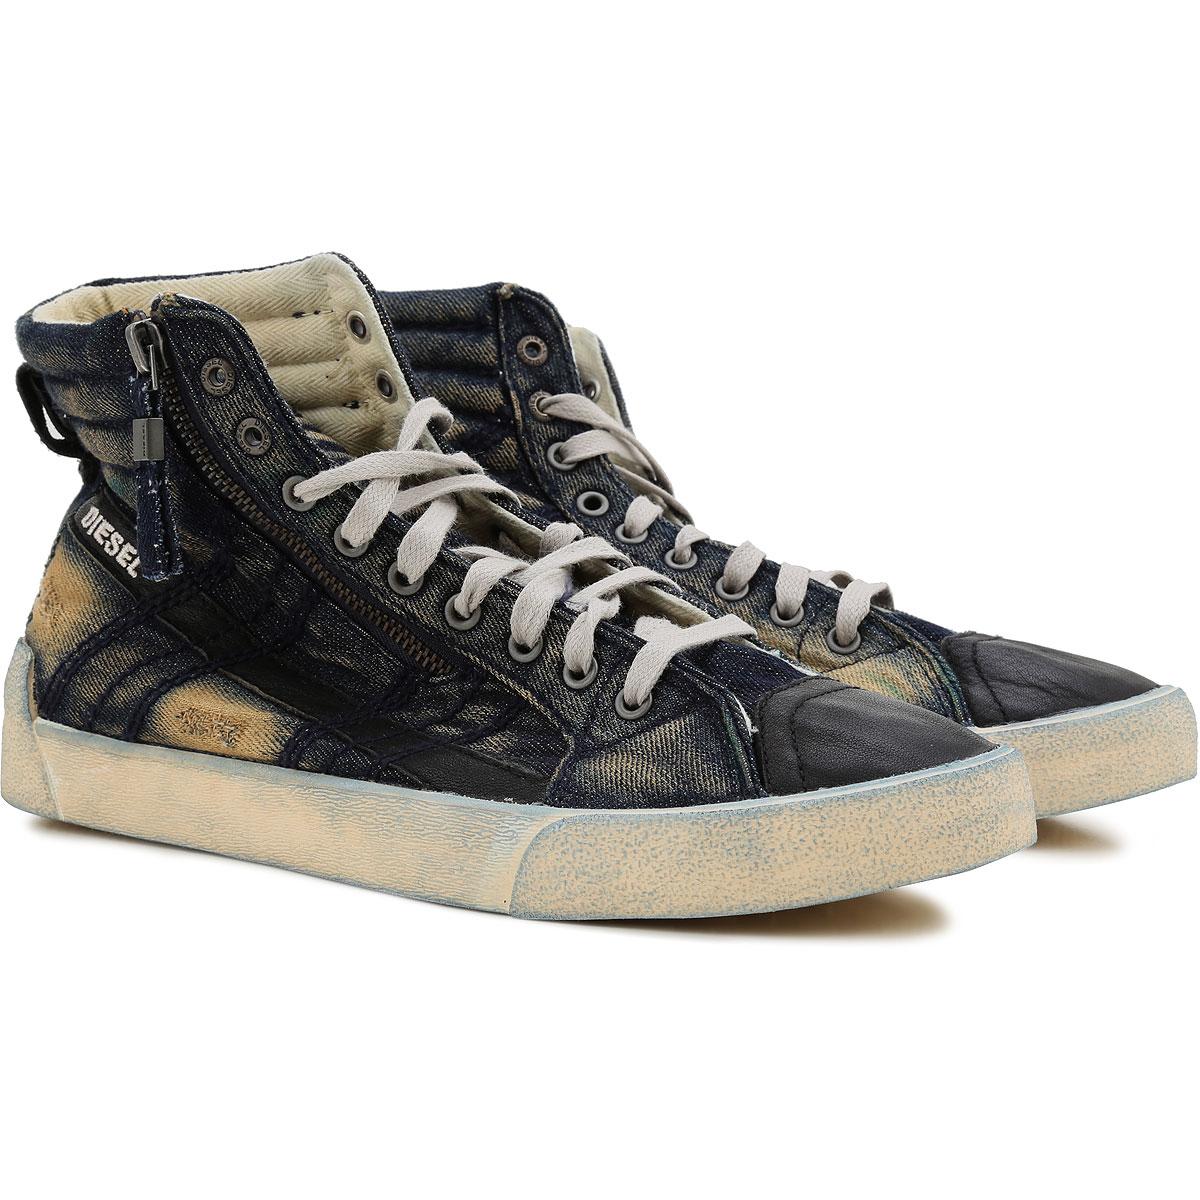 Mens Shoes Diesel, Style code: Y01169-ps315-h1729